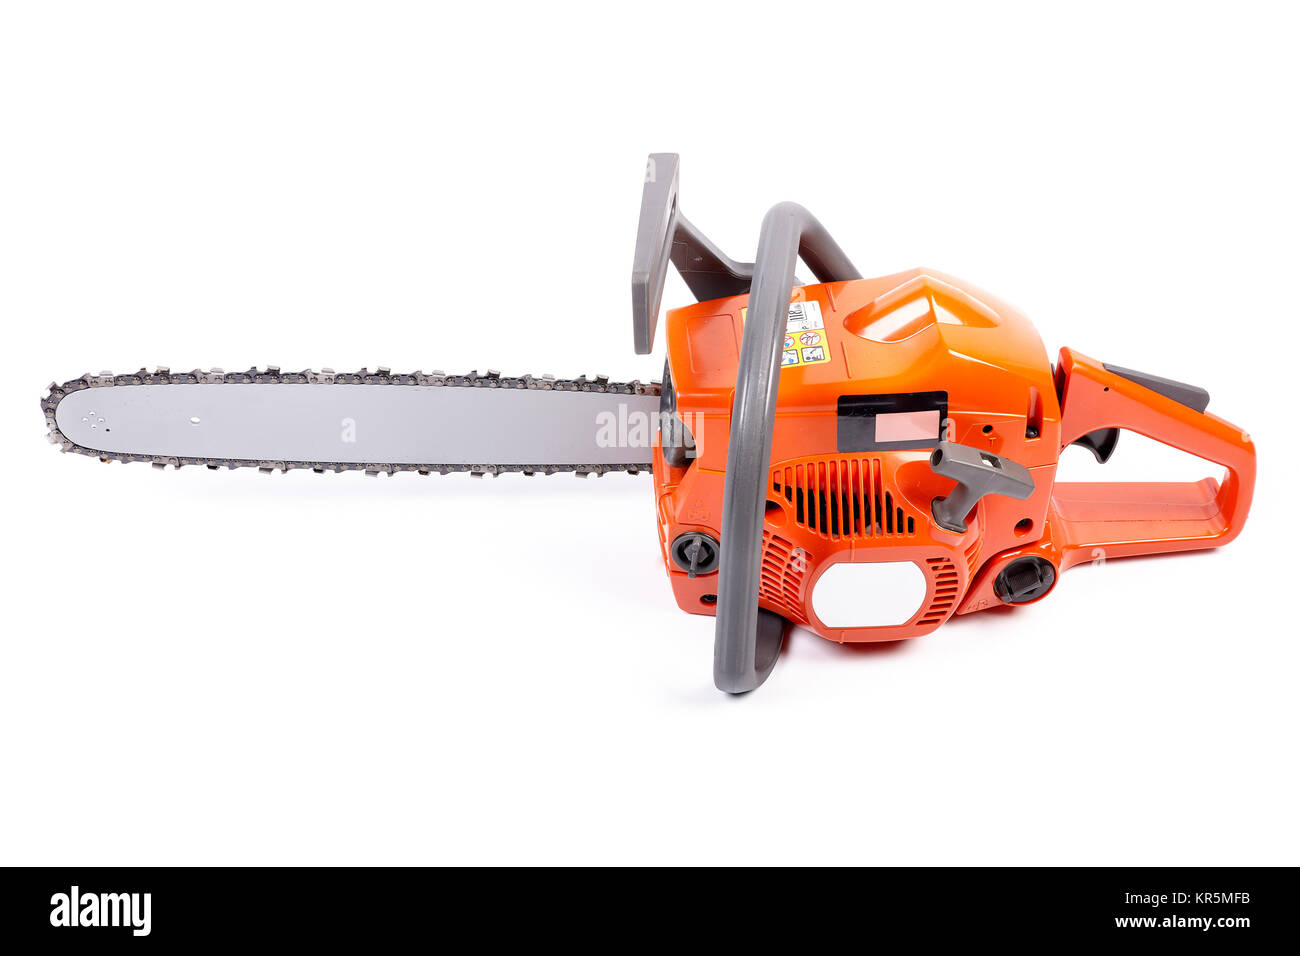 Chain saw. Stock Photo